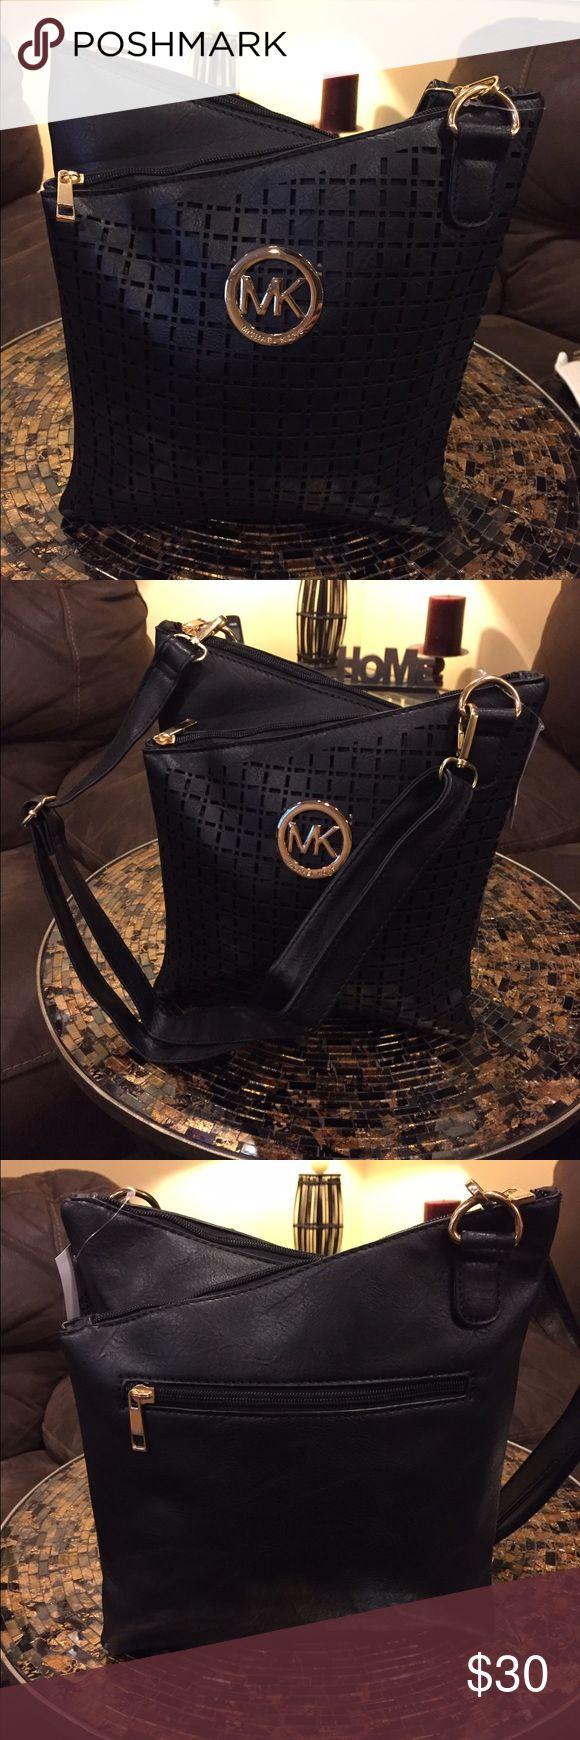 Michael kors Handbag Crossbody Handbag Michael kors brand new it's not authentic looks like real bag Michael Kors Bags Crossbody Bags